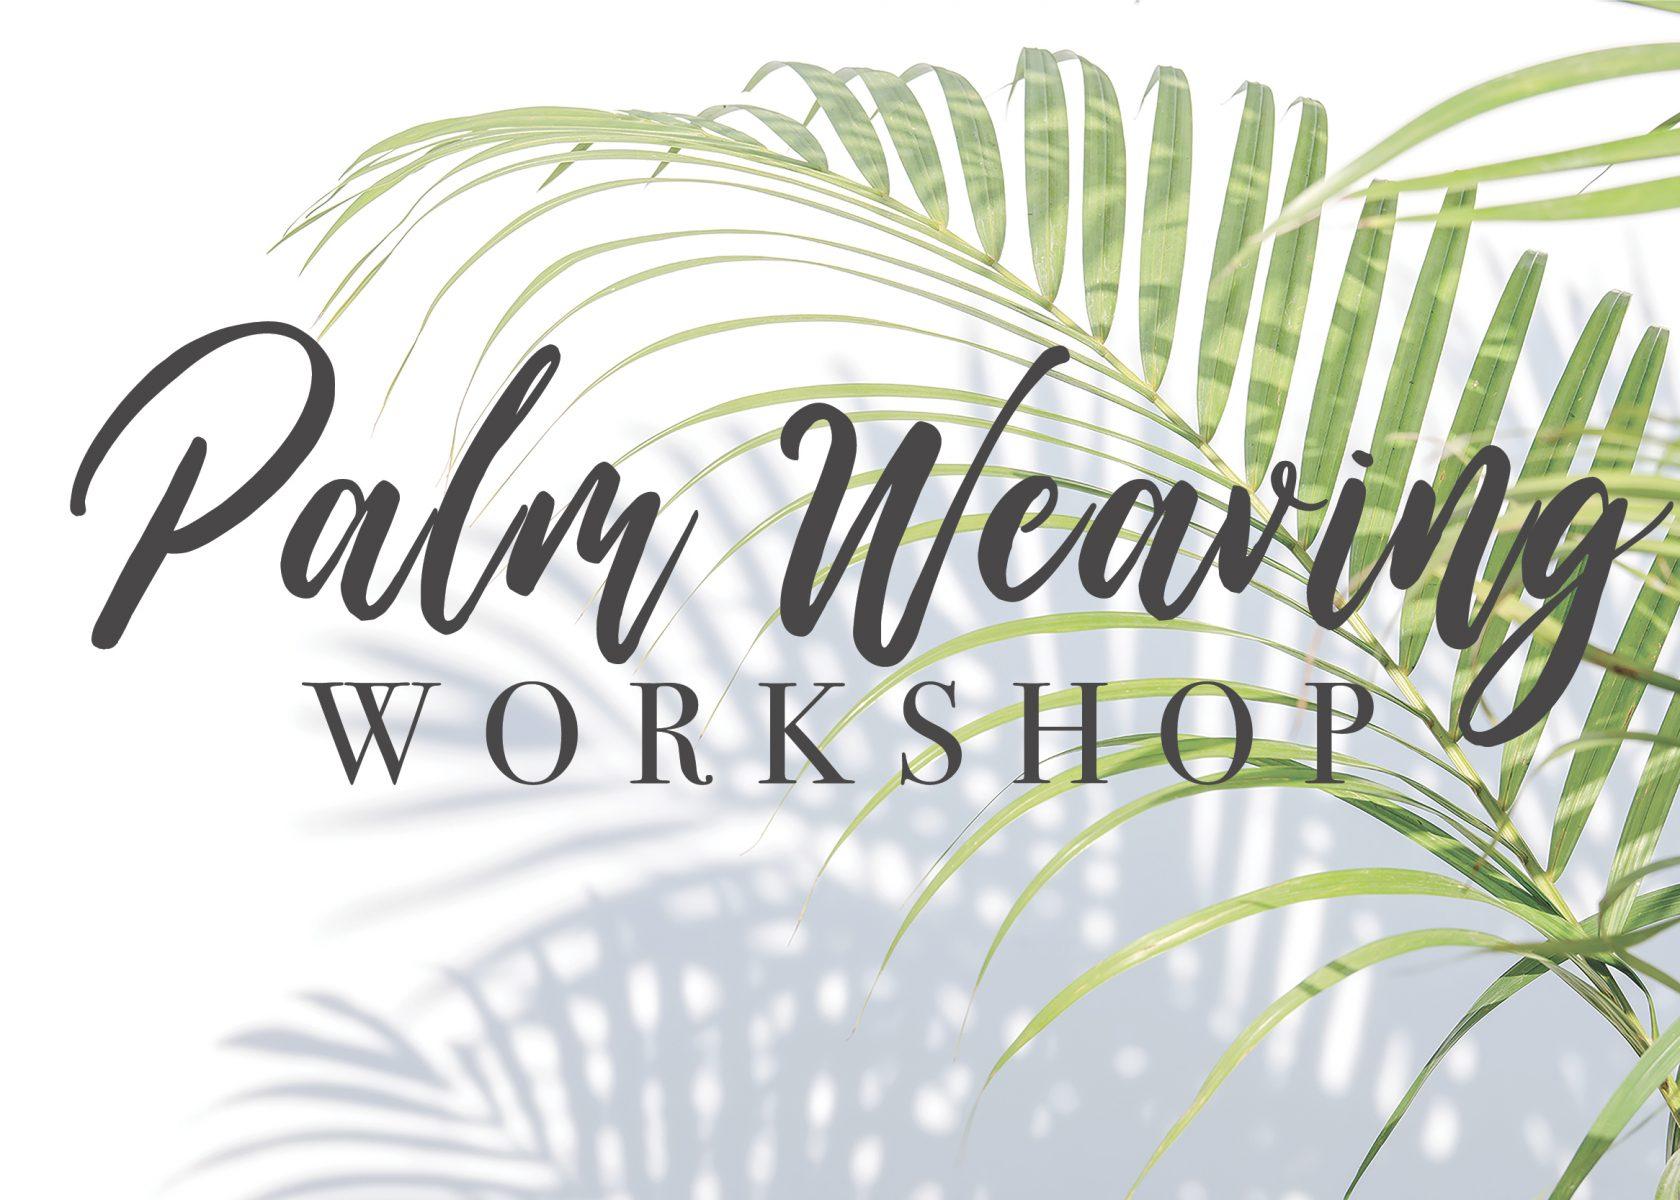 Palm Weaving Workshop